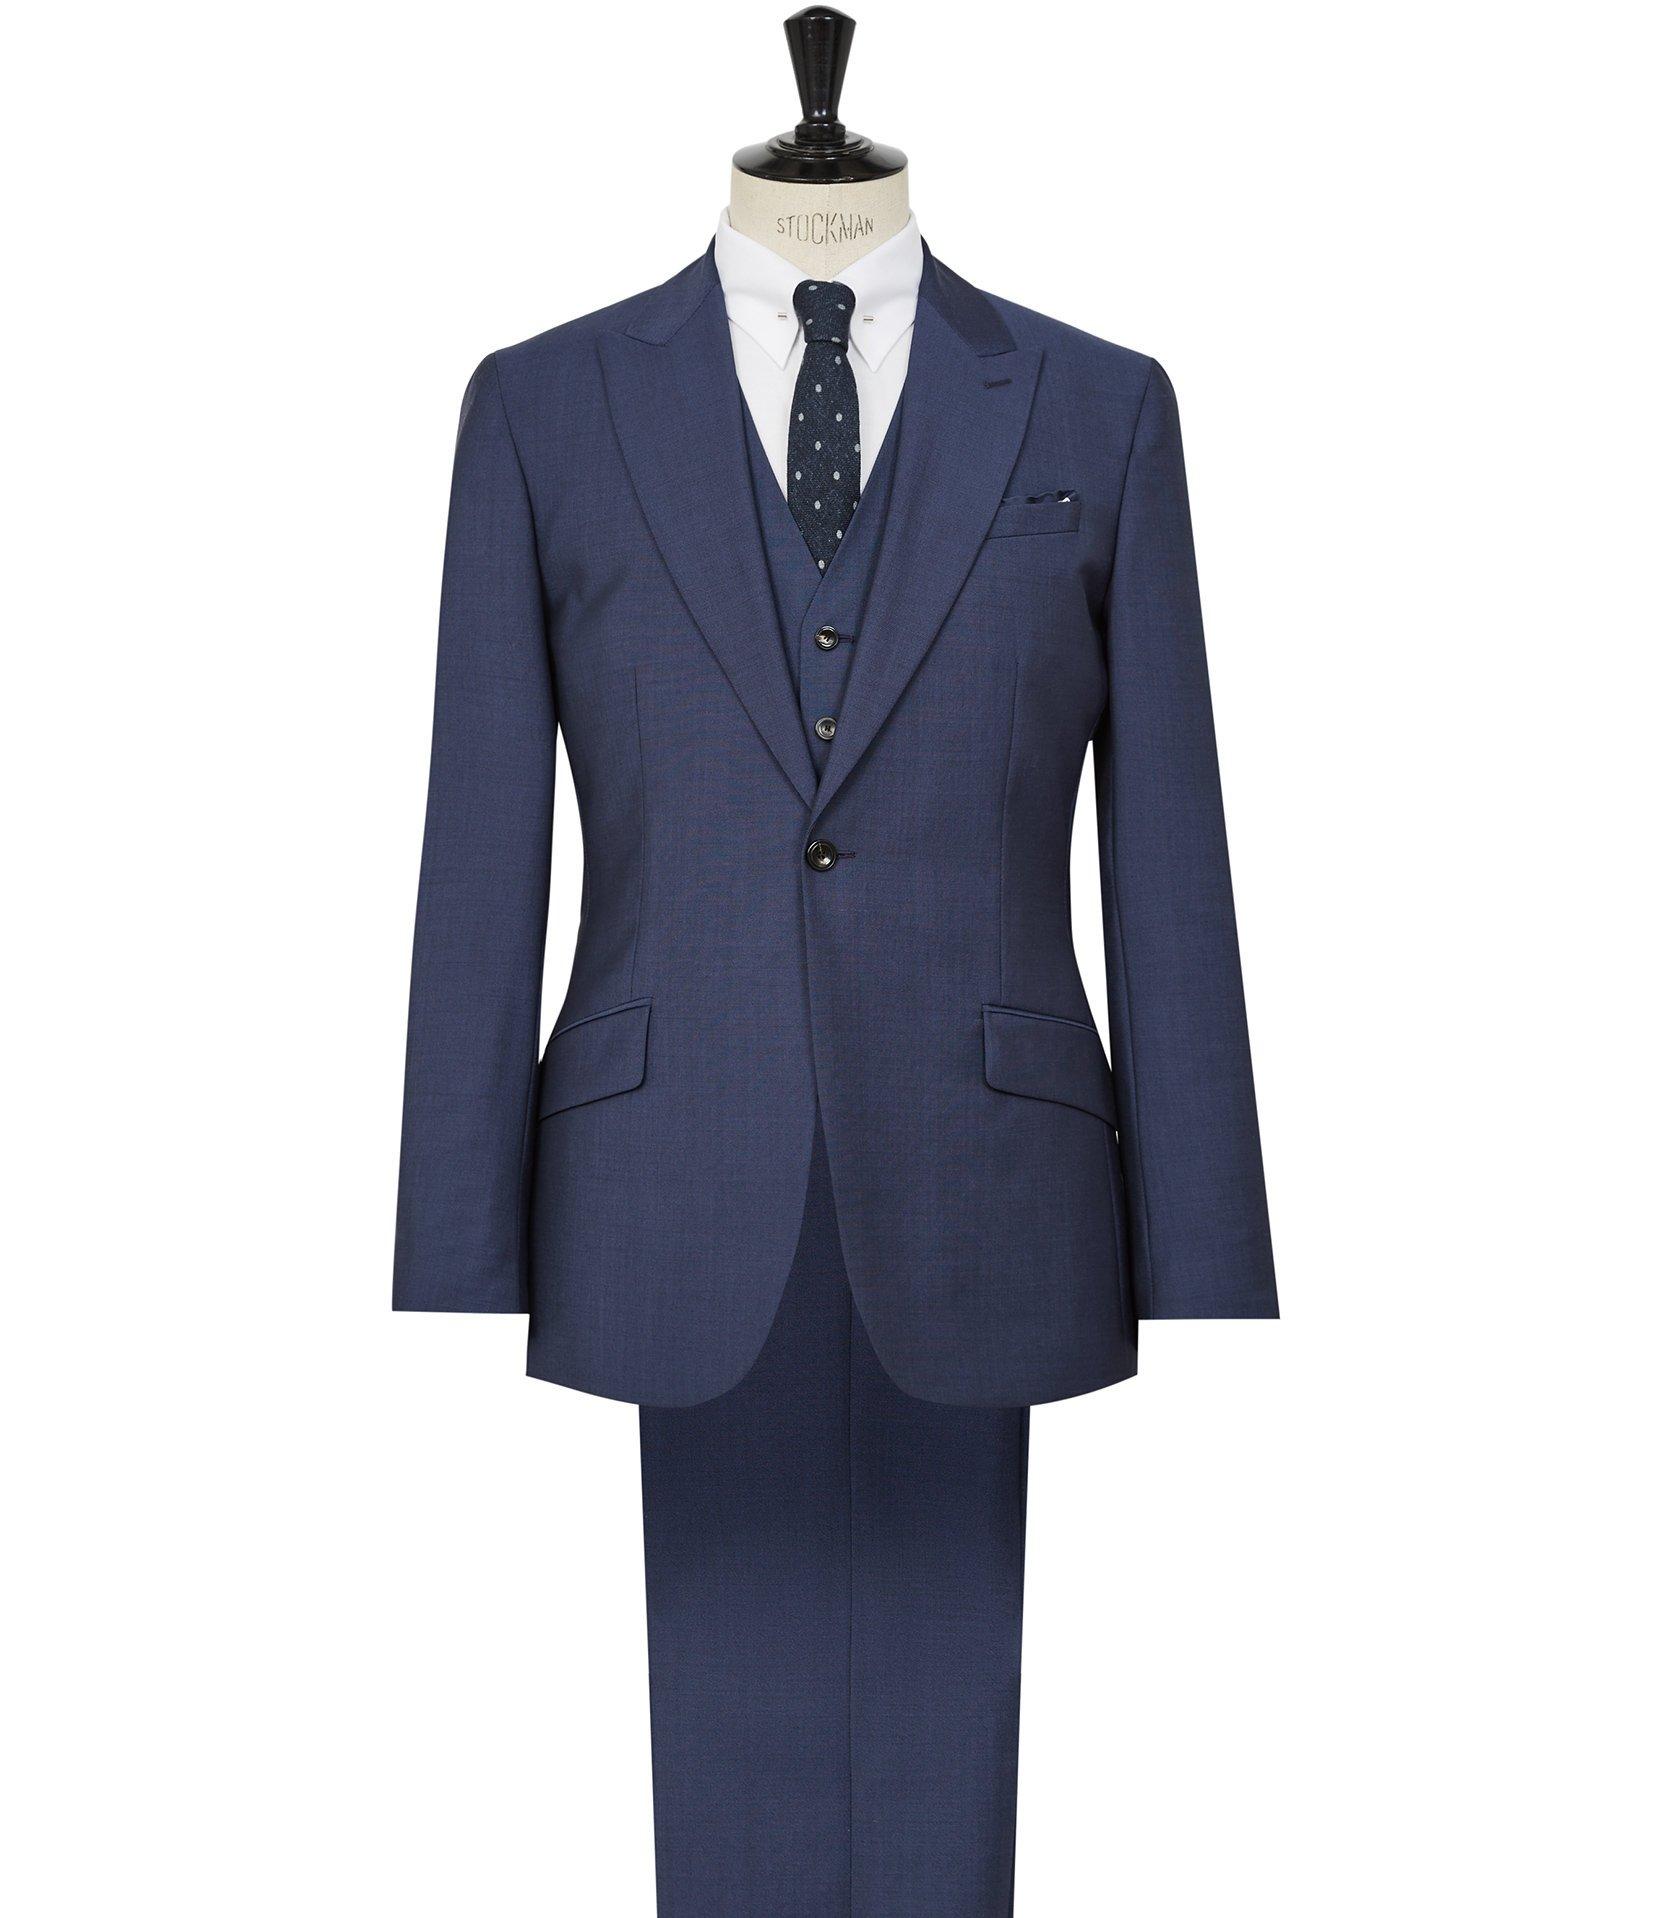 Men's Suits & Tailoring